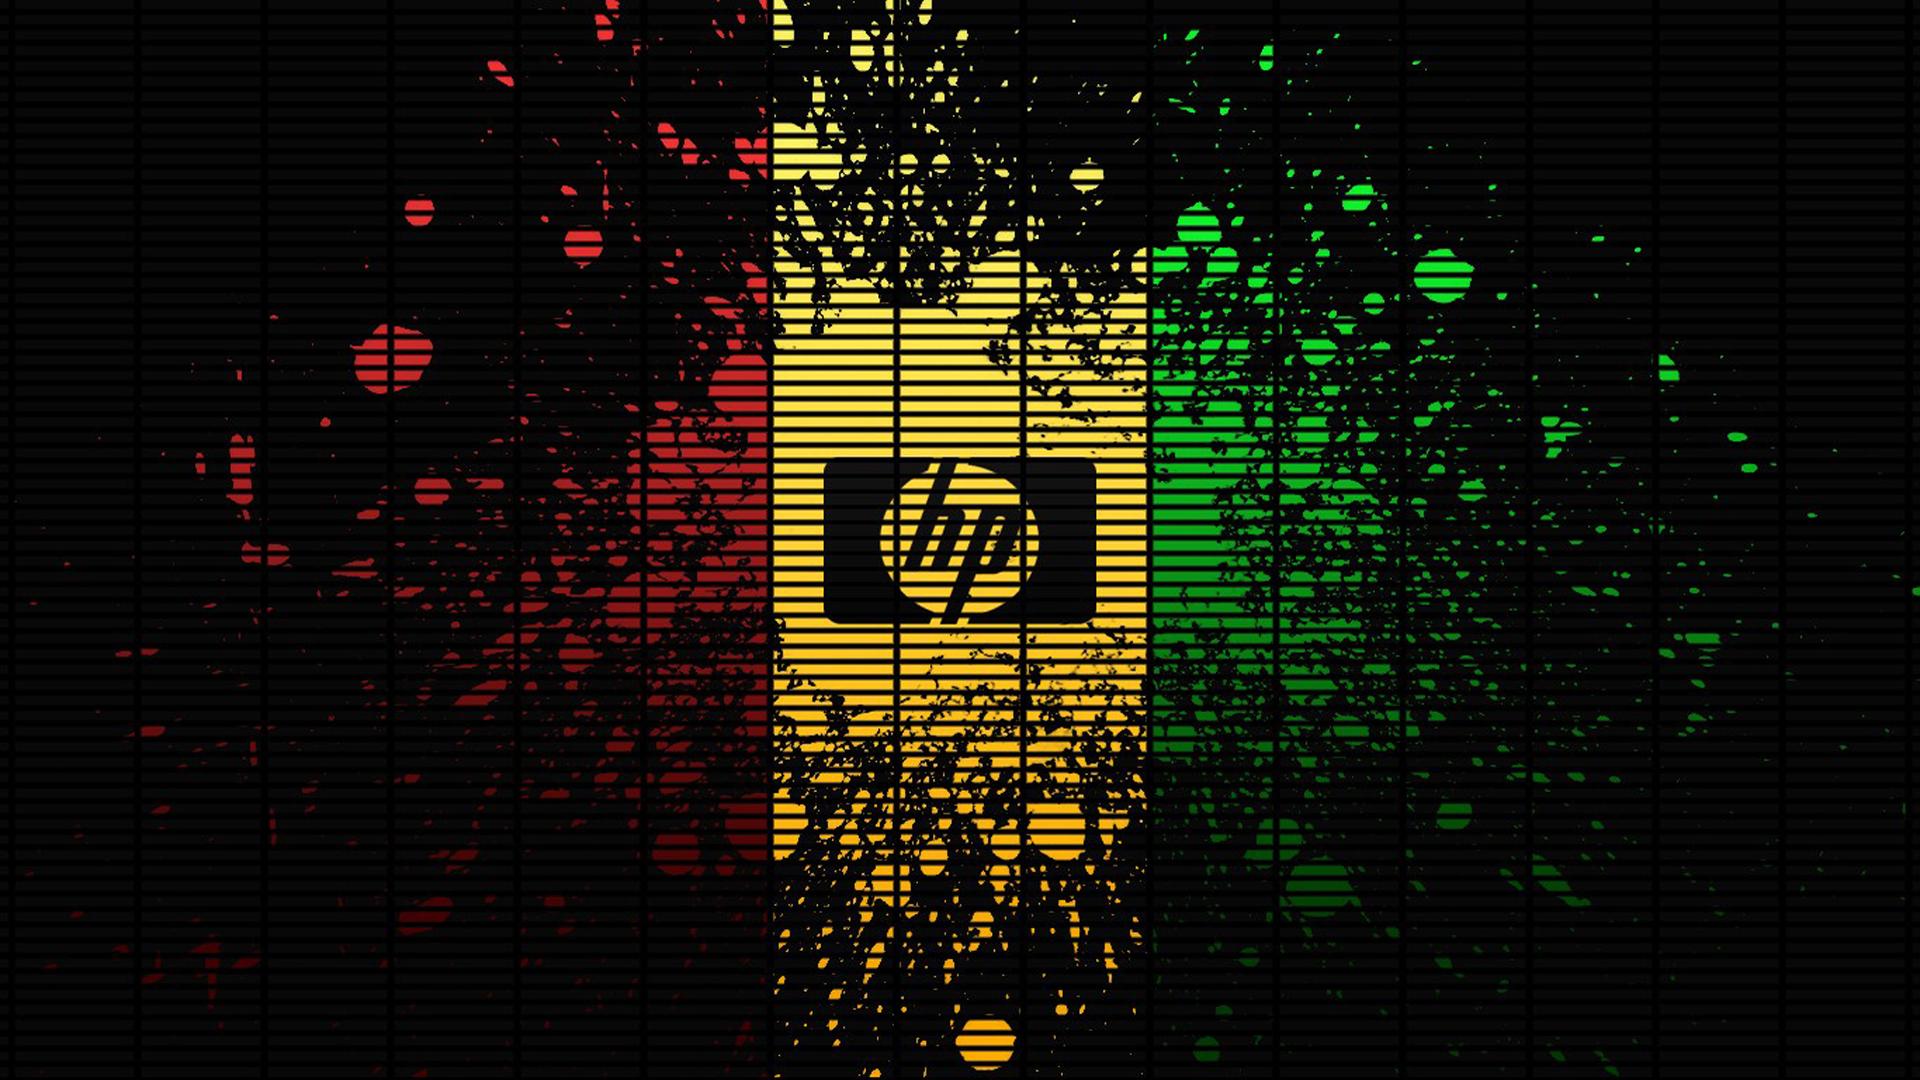 HP Wallpaper 5903 Px